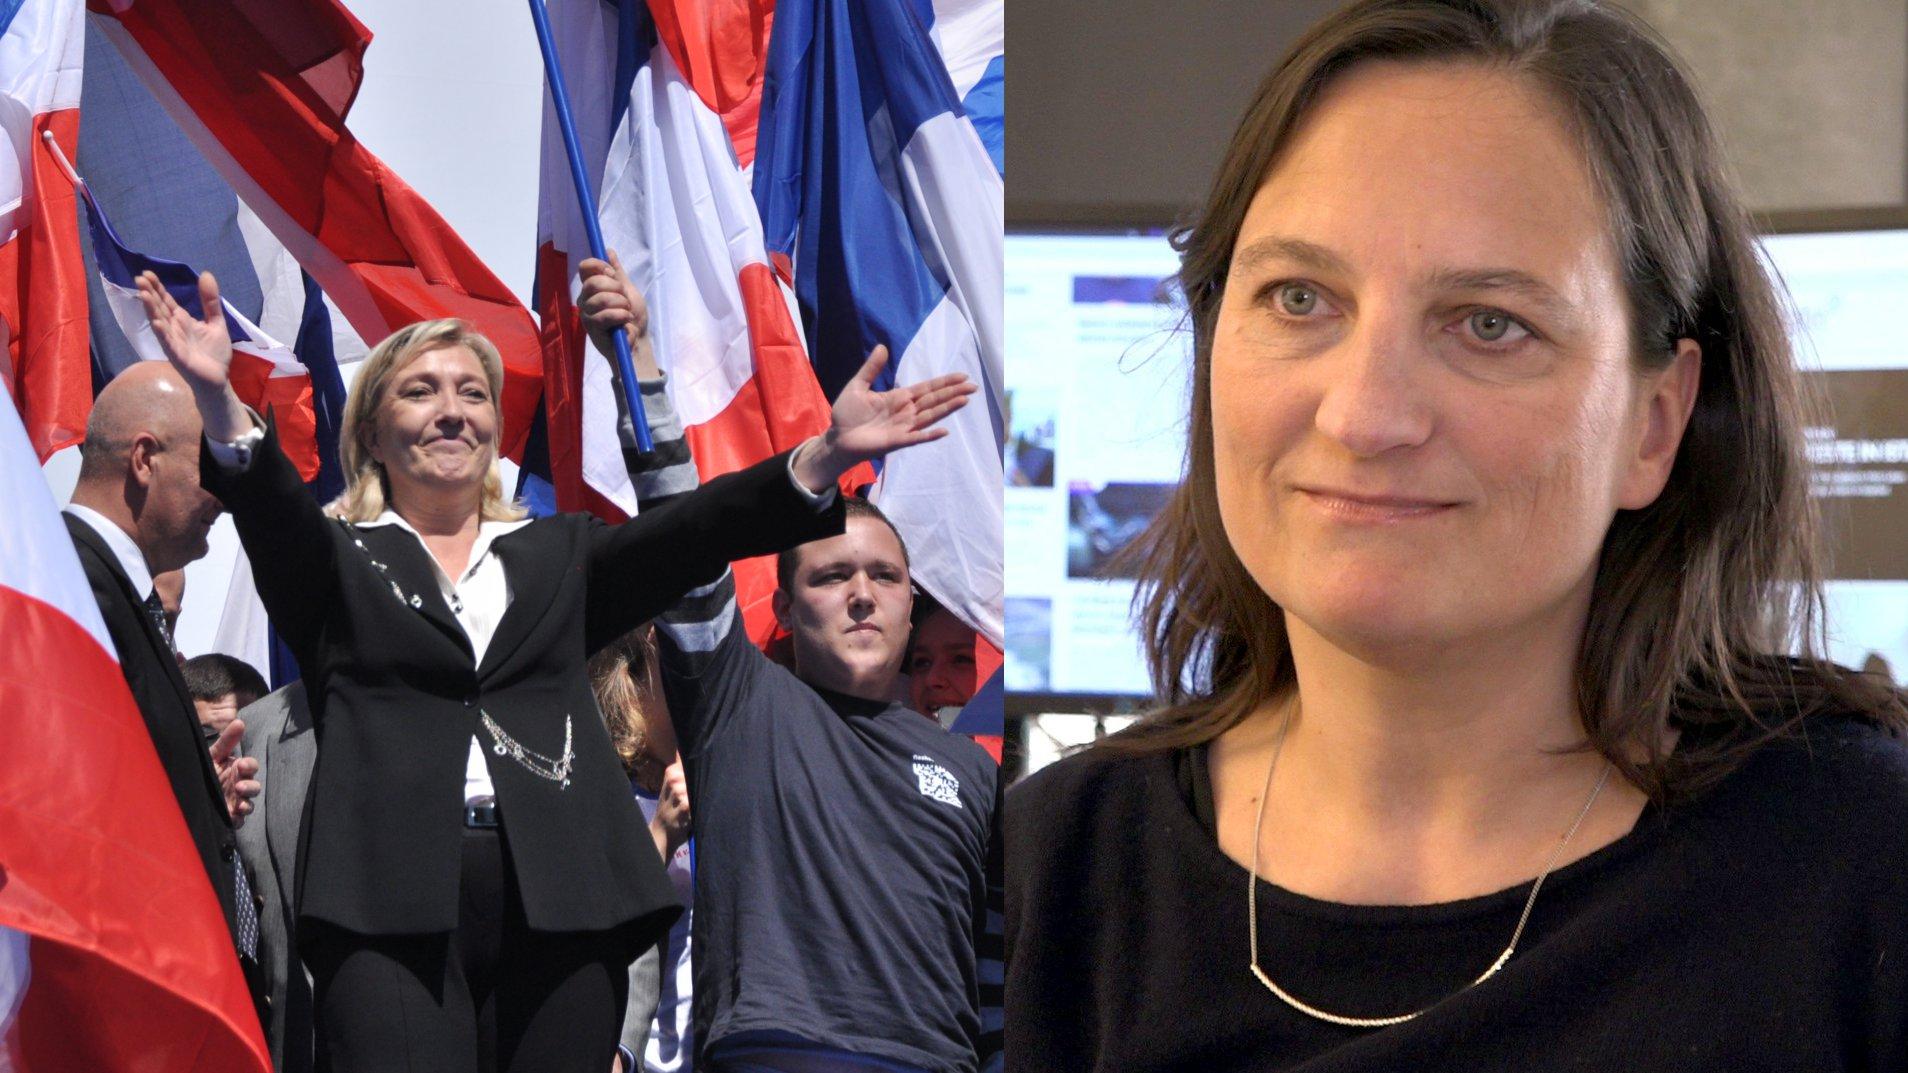 Wie tickt Marine Le Pen? Interview mit Tanja Kuchenbecker | Foto: Blandine Le Cain